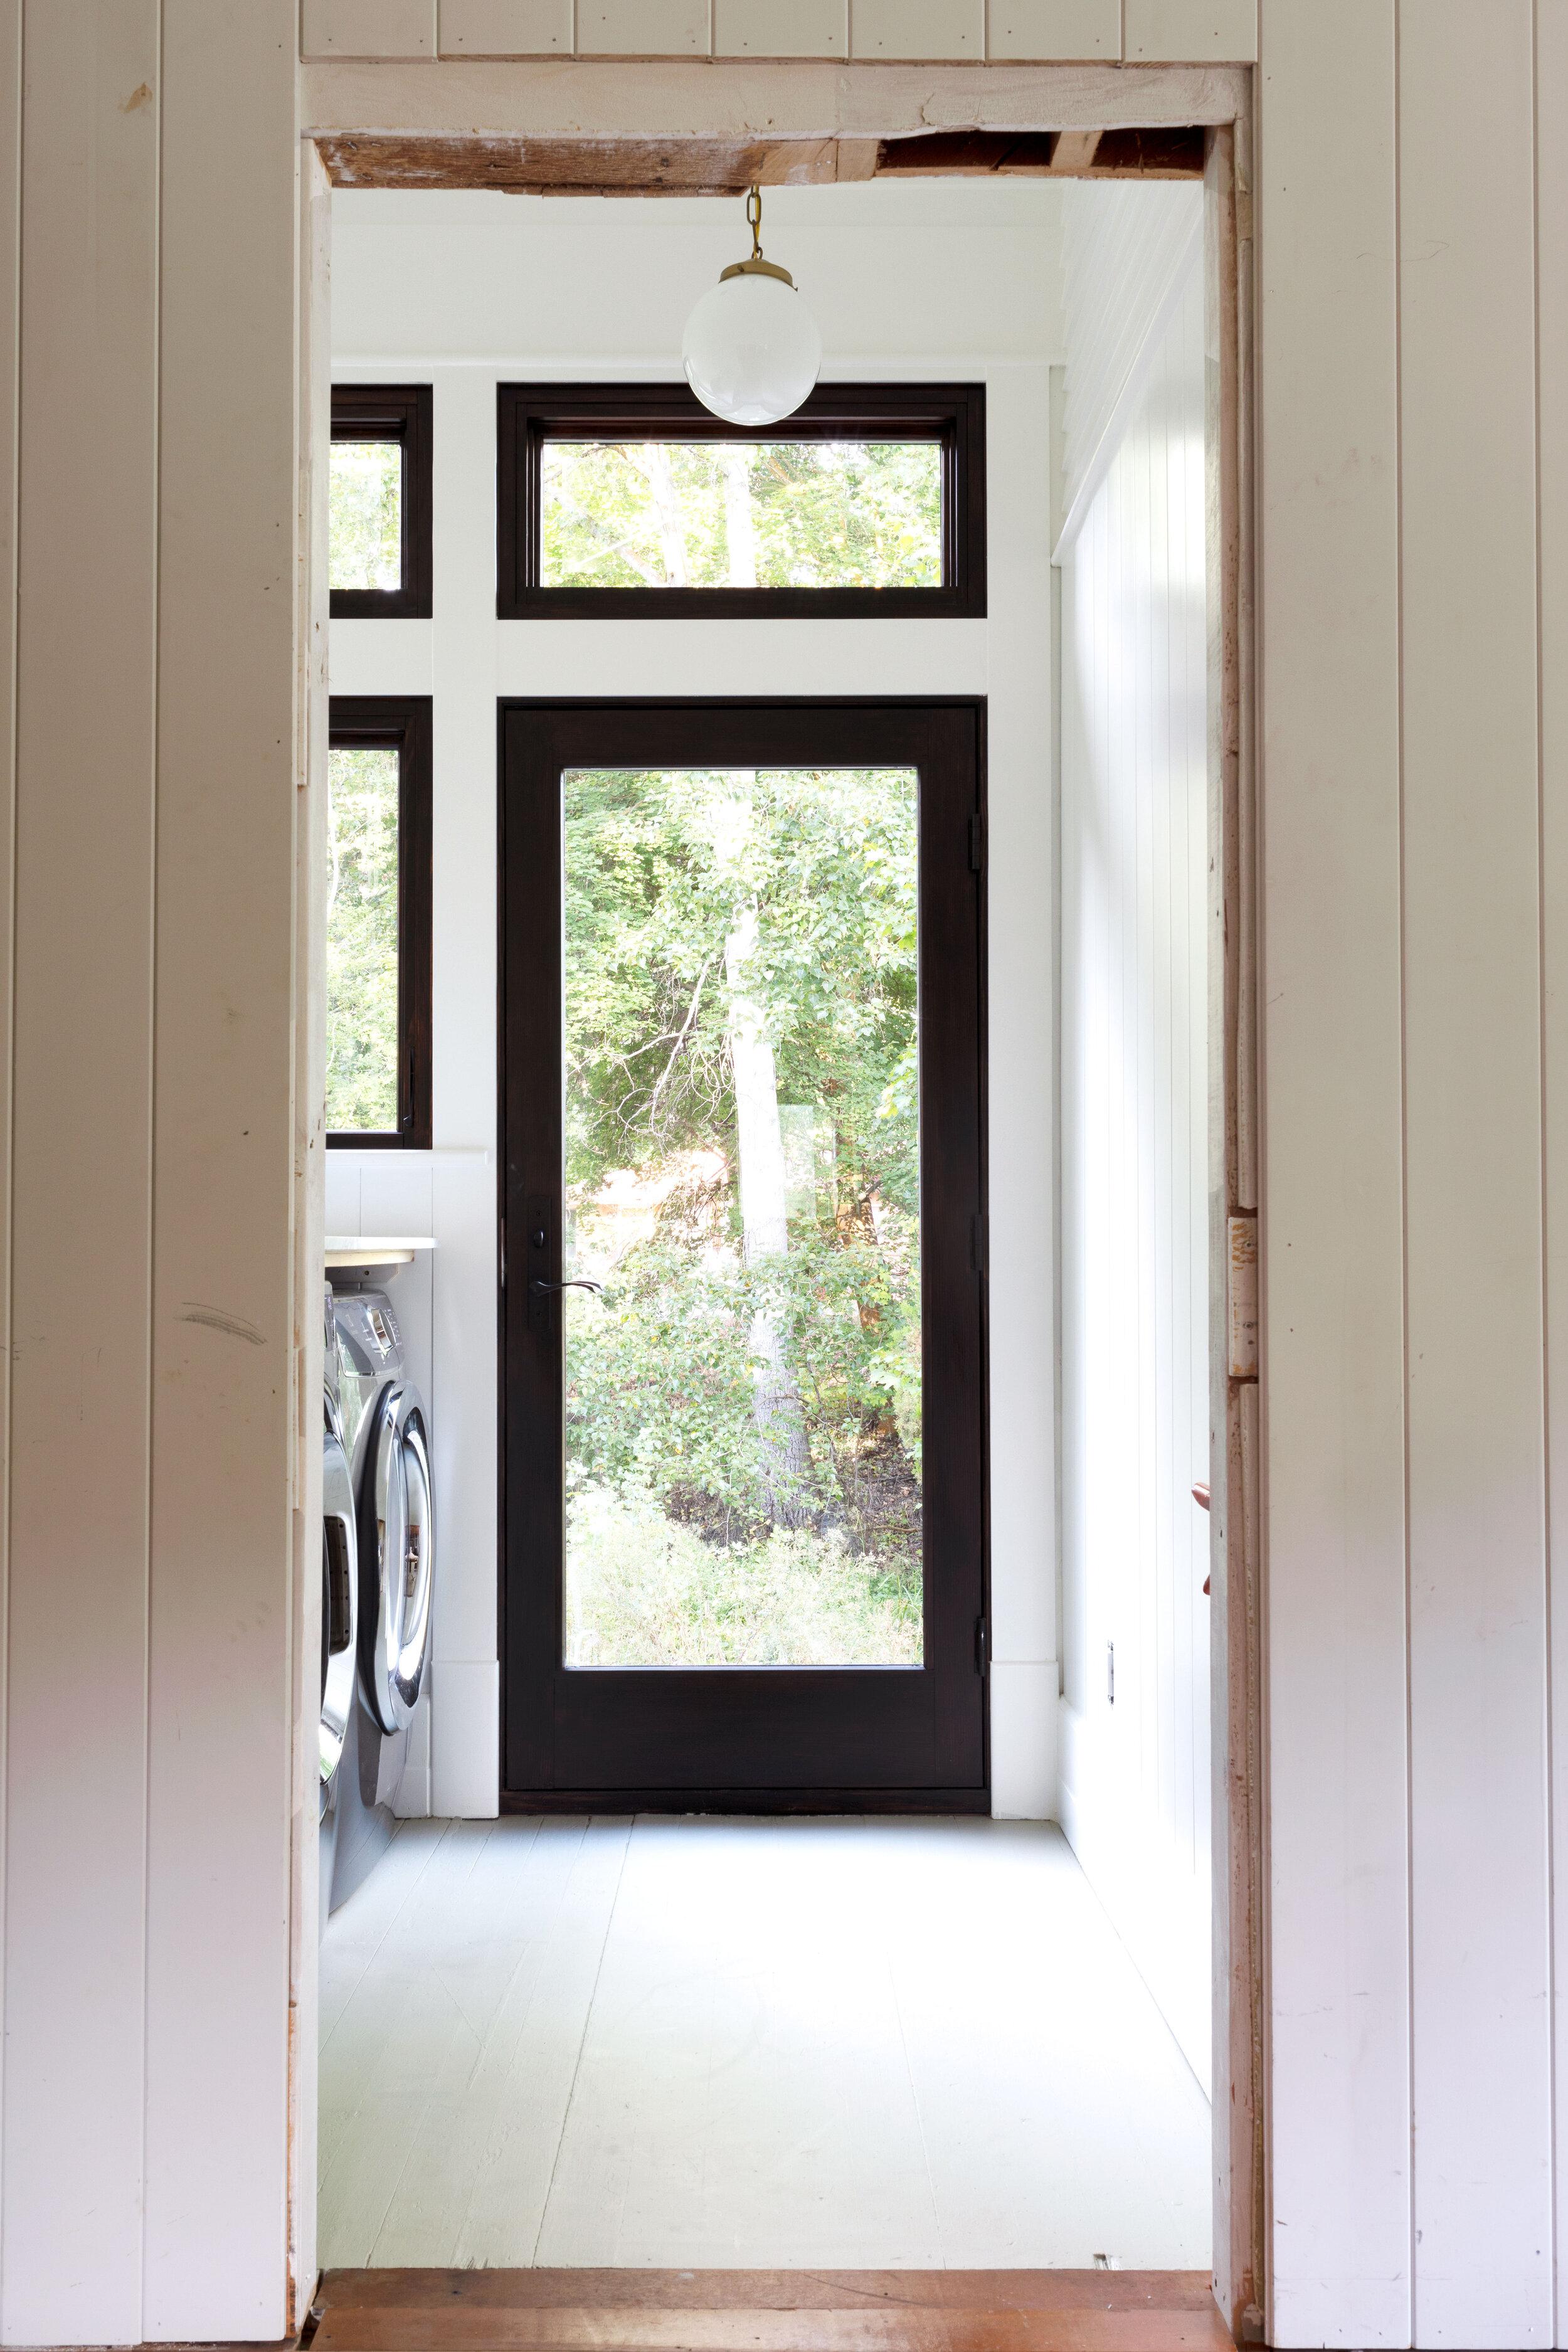 The Grit and Polish - Farmhouse Laundry Rm - How to Paint Any Wood Floors.jpg